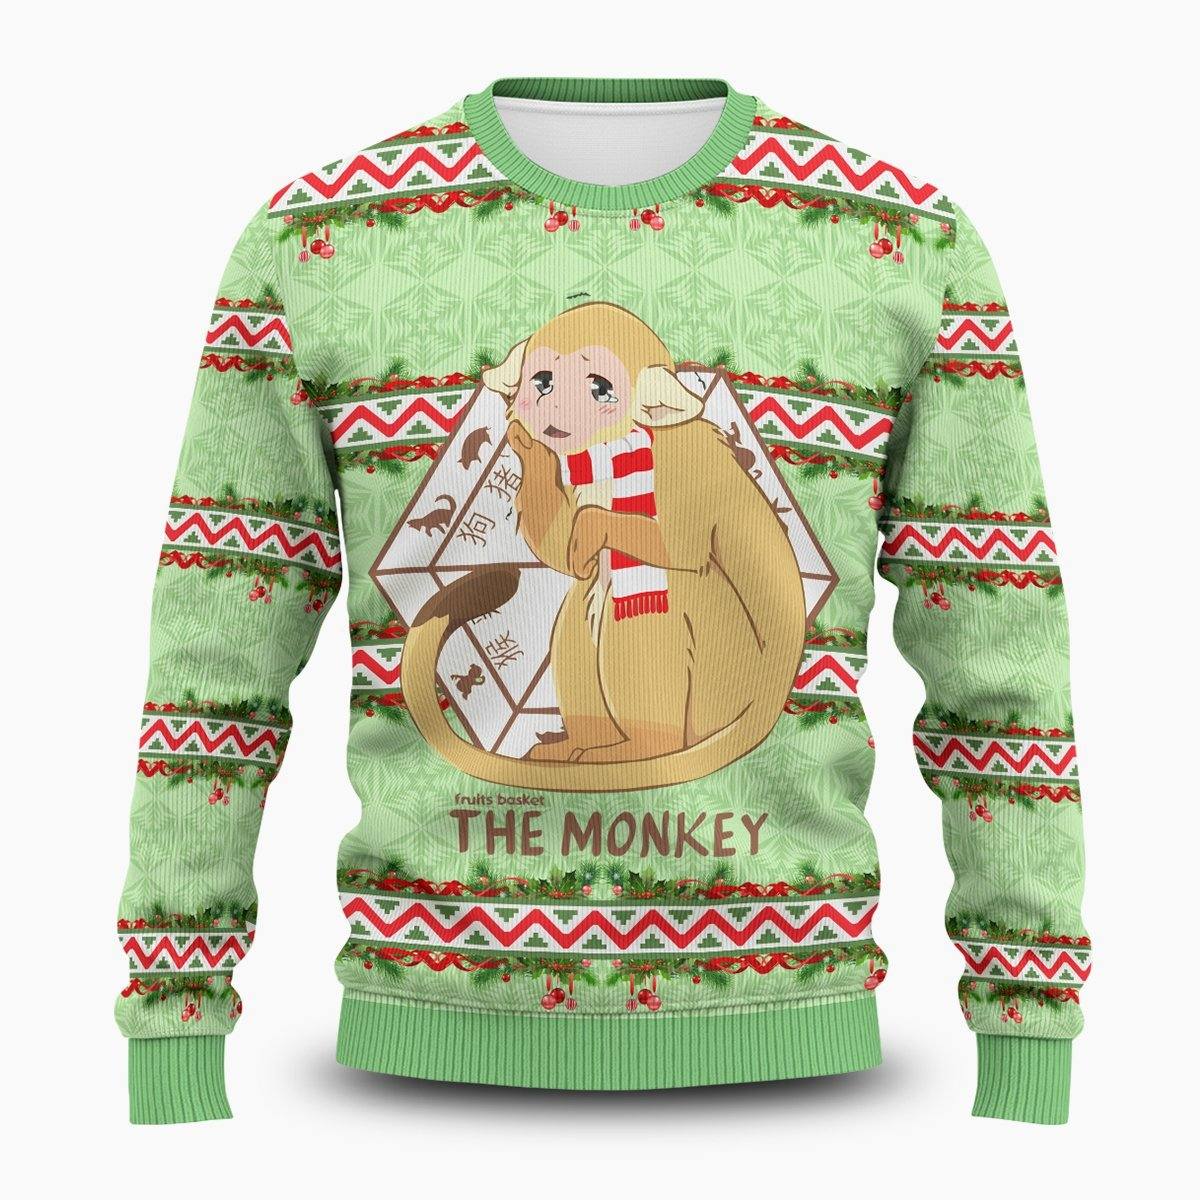 Ritsu The Monkey Unisex Wool Sweater FDM0310 S Official Otaku Treat Merch